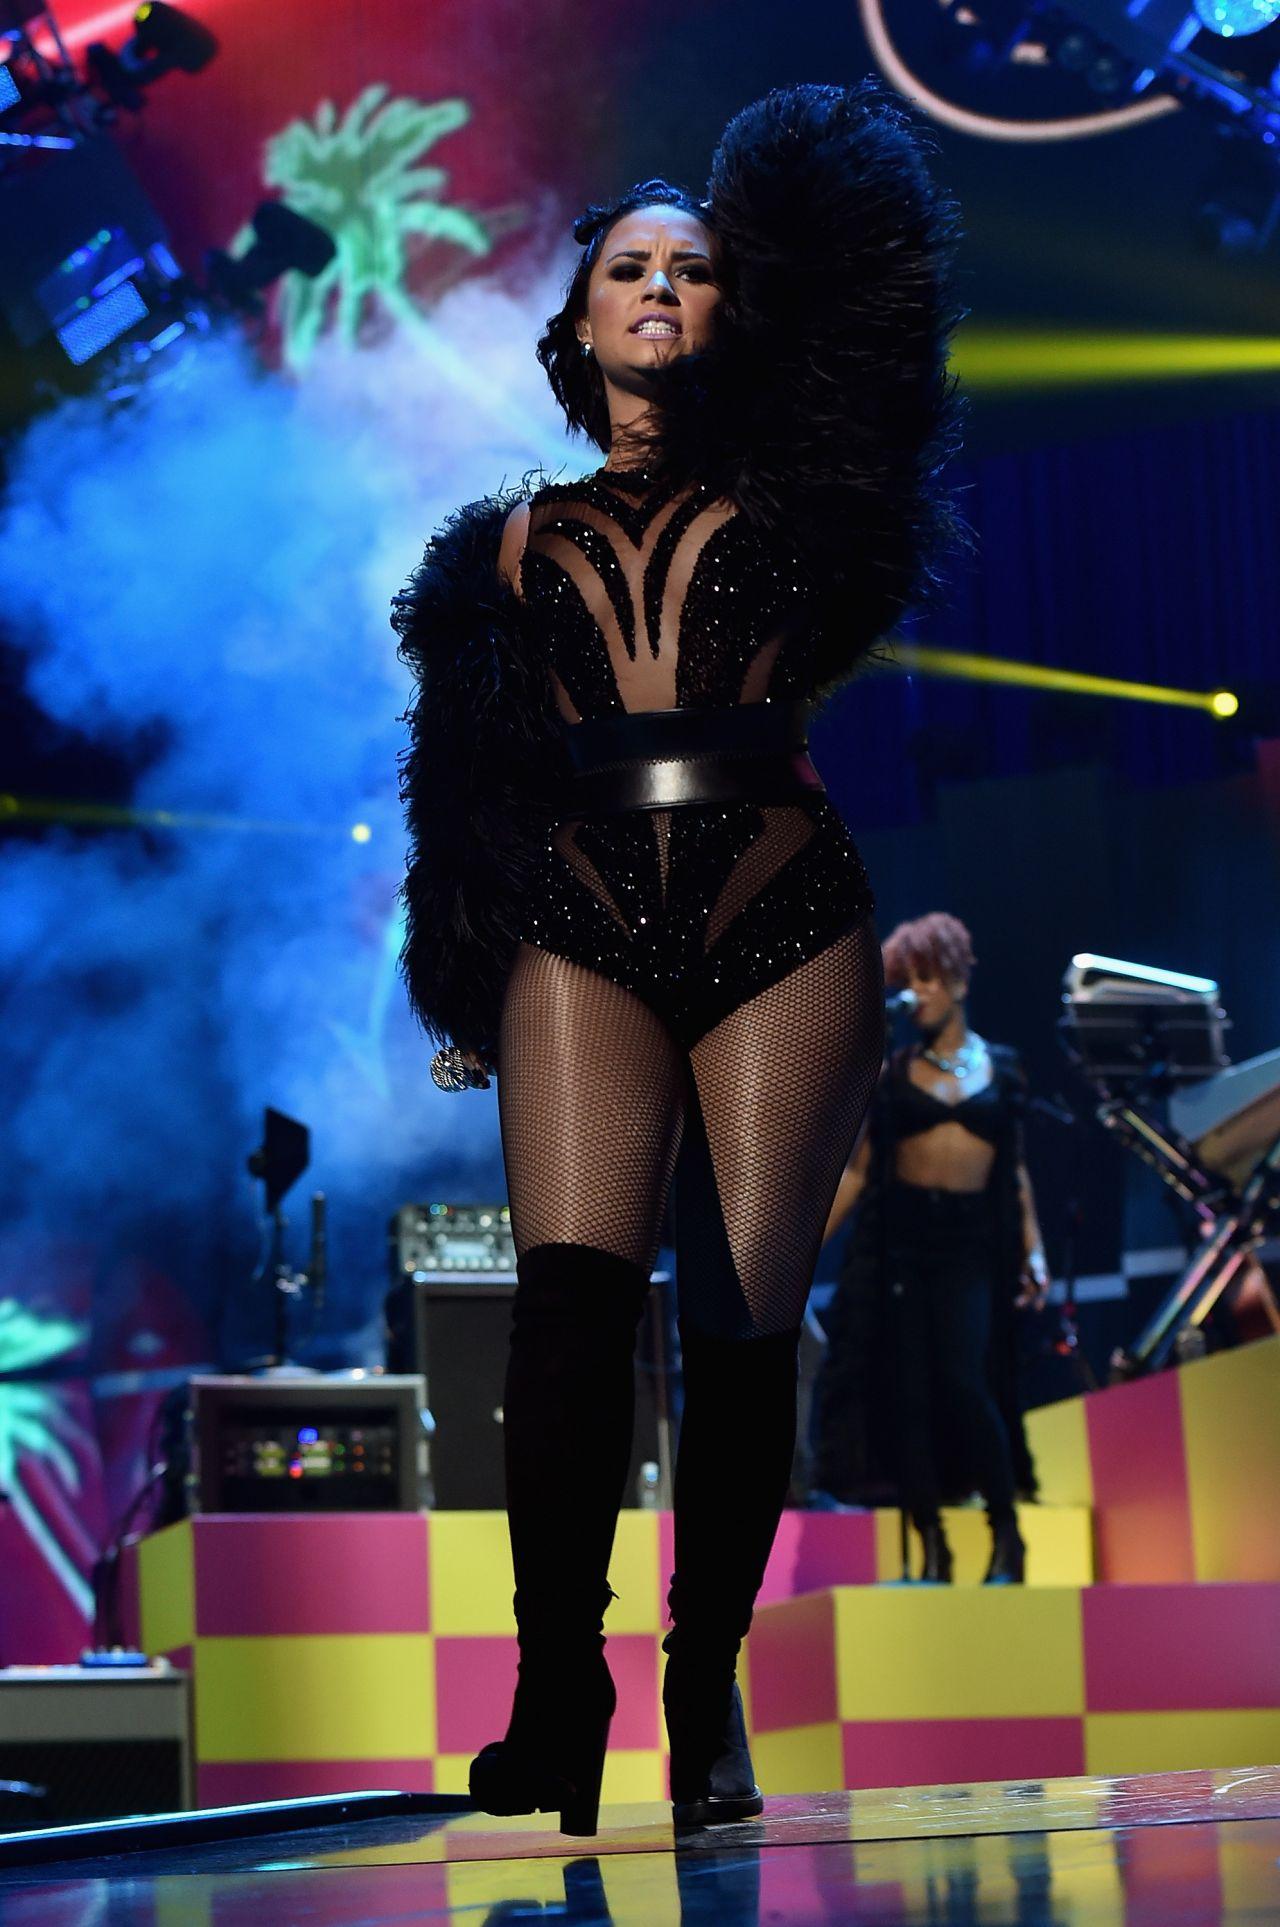 Demi Lovato Performs Iheartradio Music Festival Las Vegas September 15